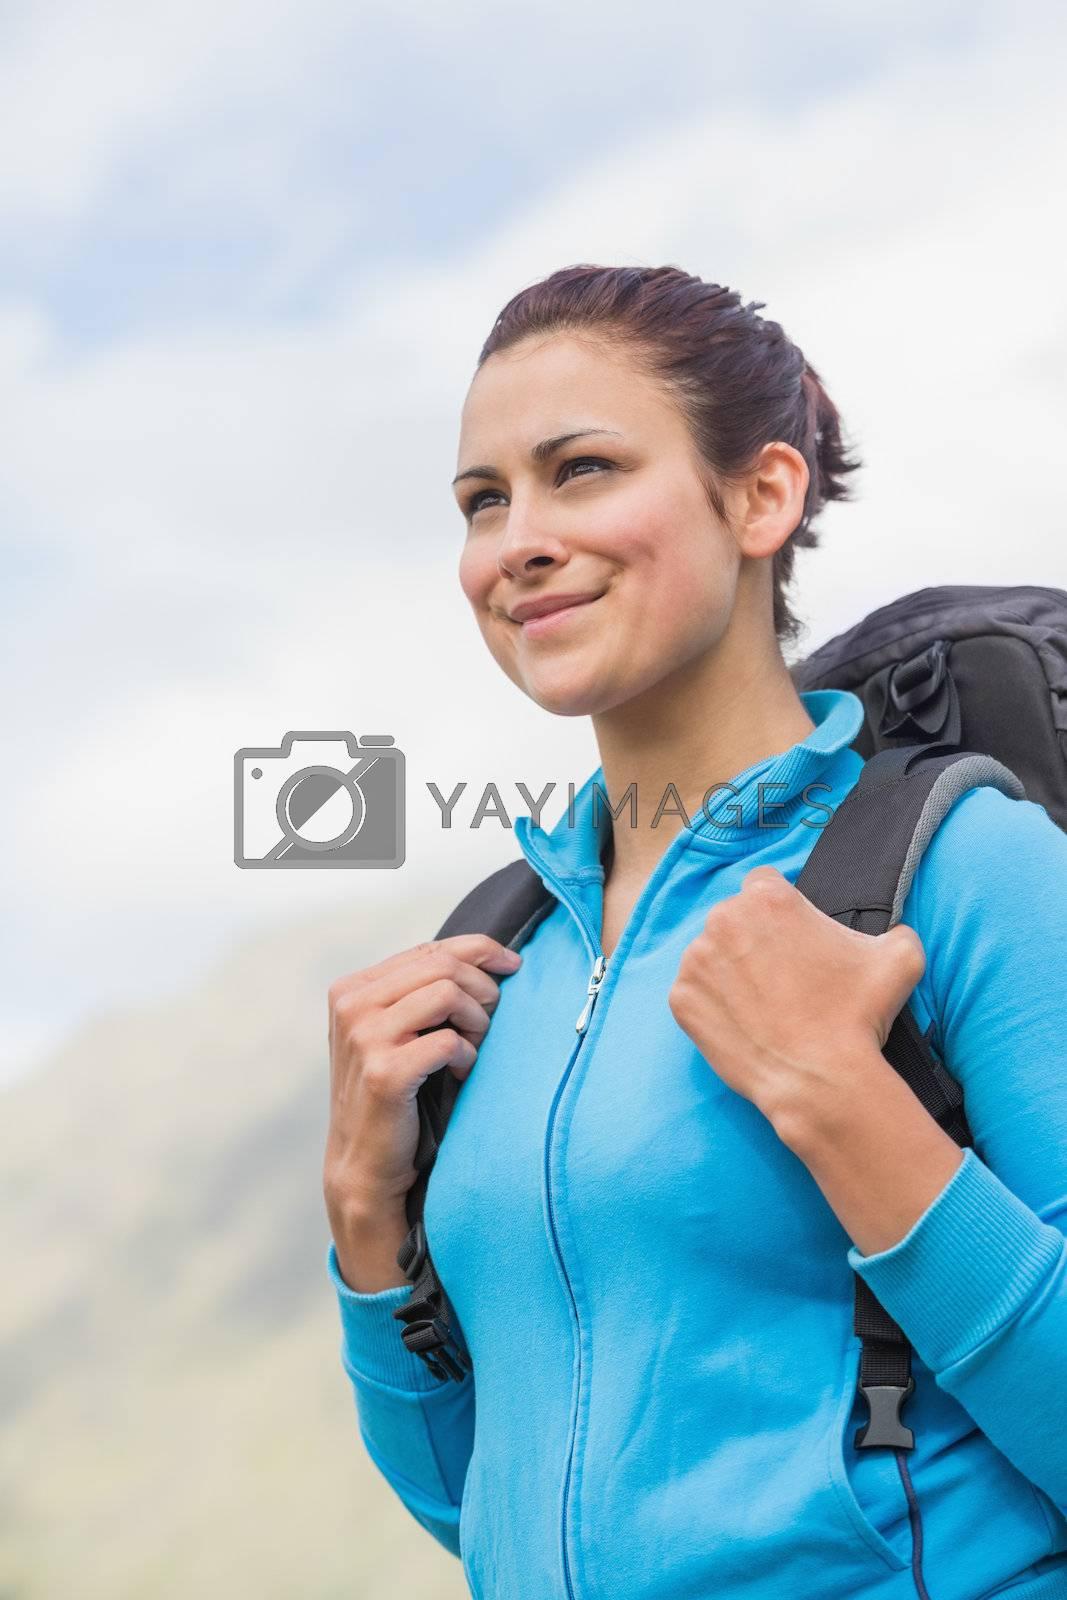 Smiling female hiker with backpack  by Wavebreakmedia